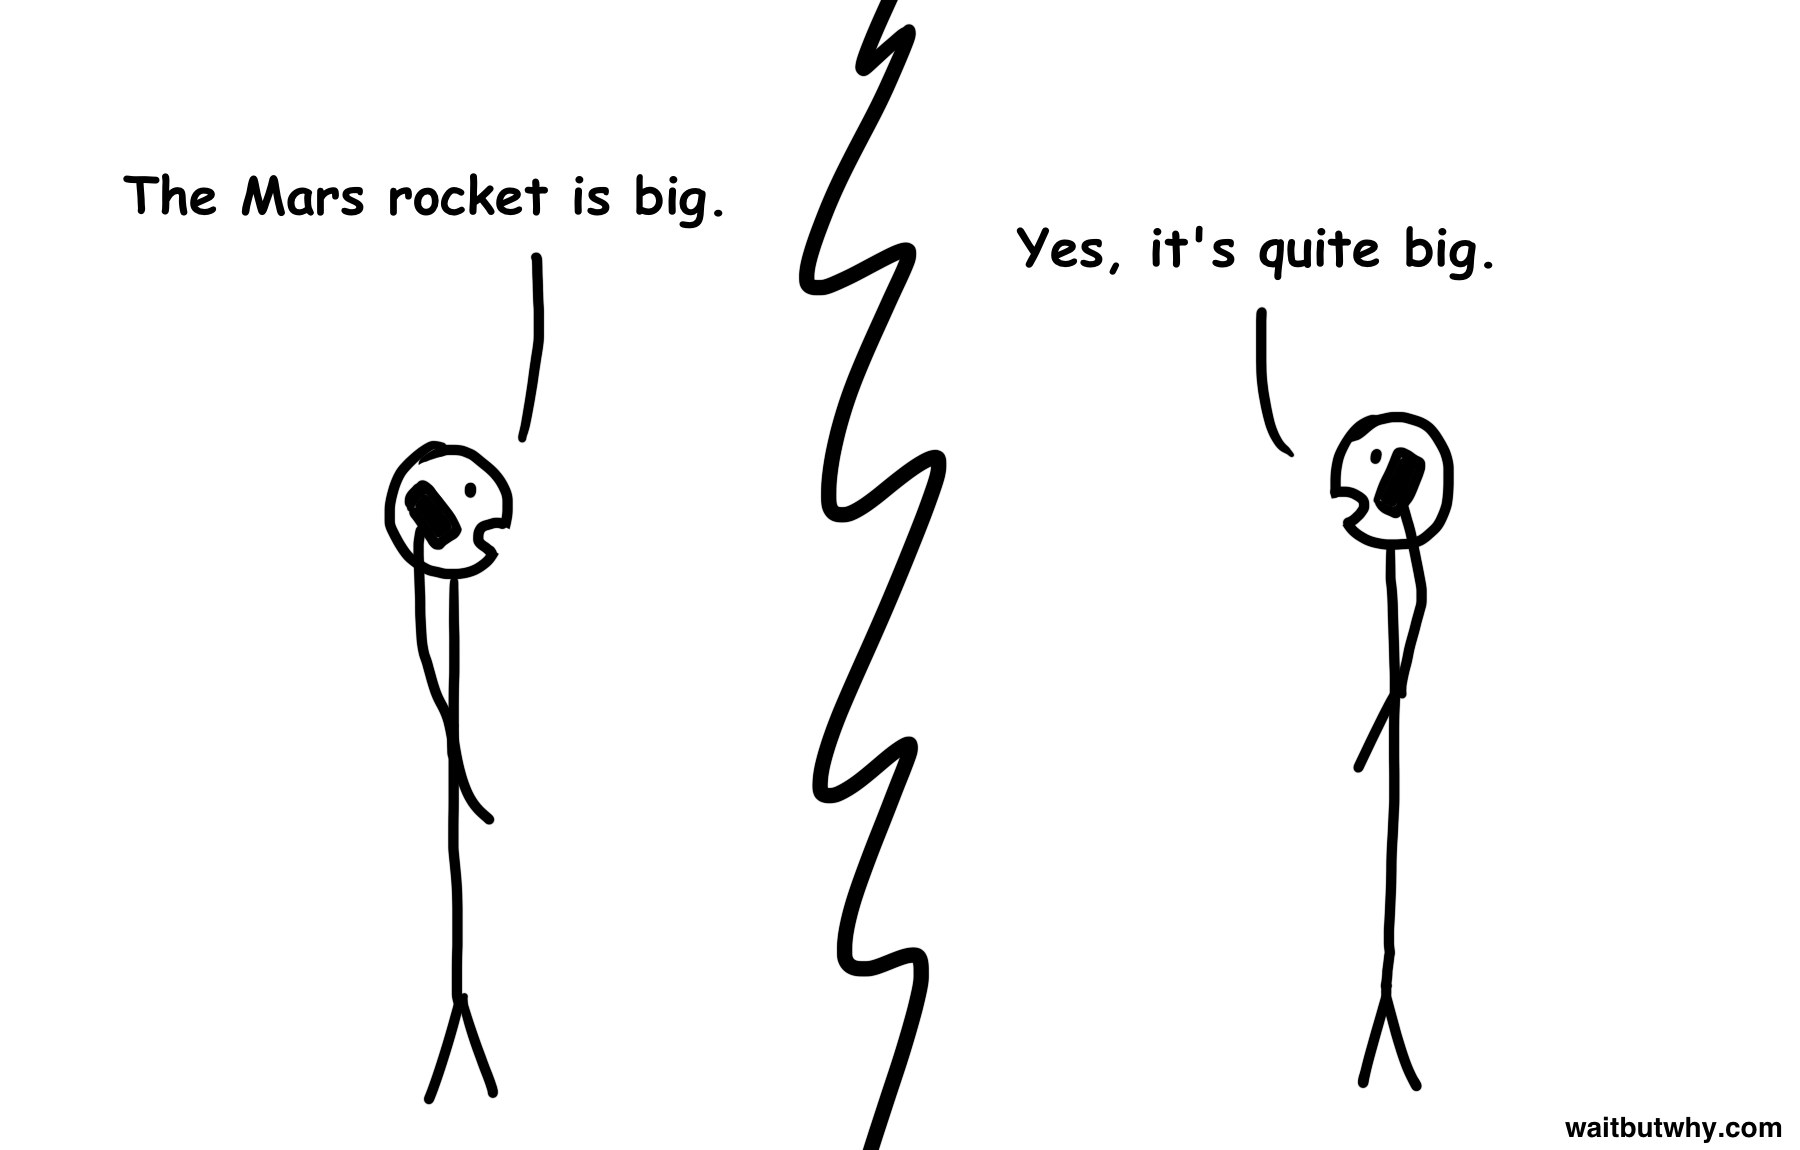 Tim: The Mars rocket is big. Elon: Yes, it's quite big.